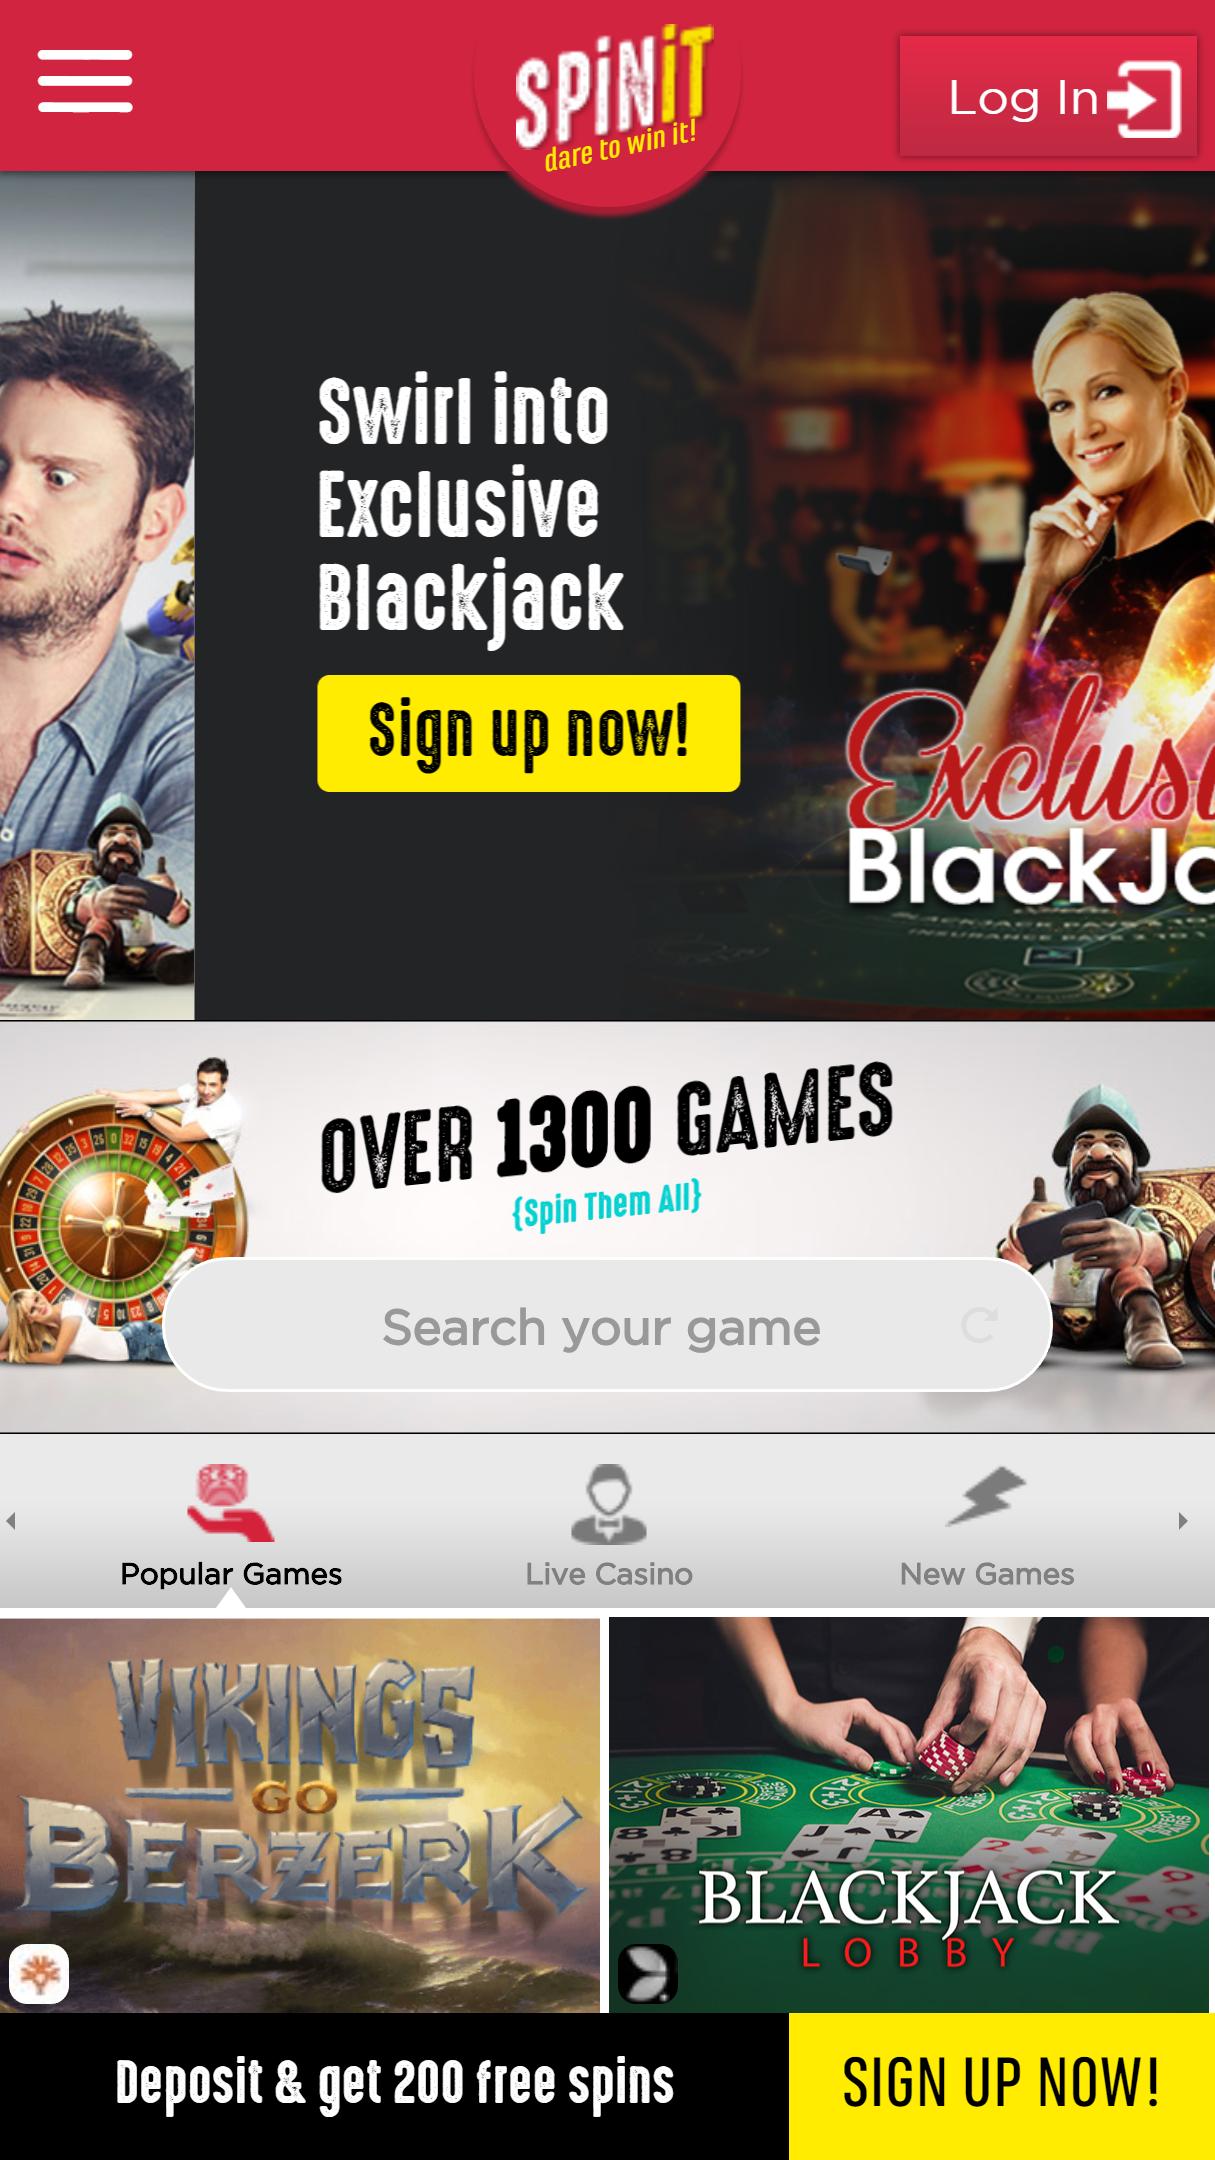 SpinIt Casino App Homepage